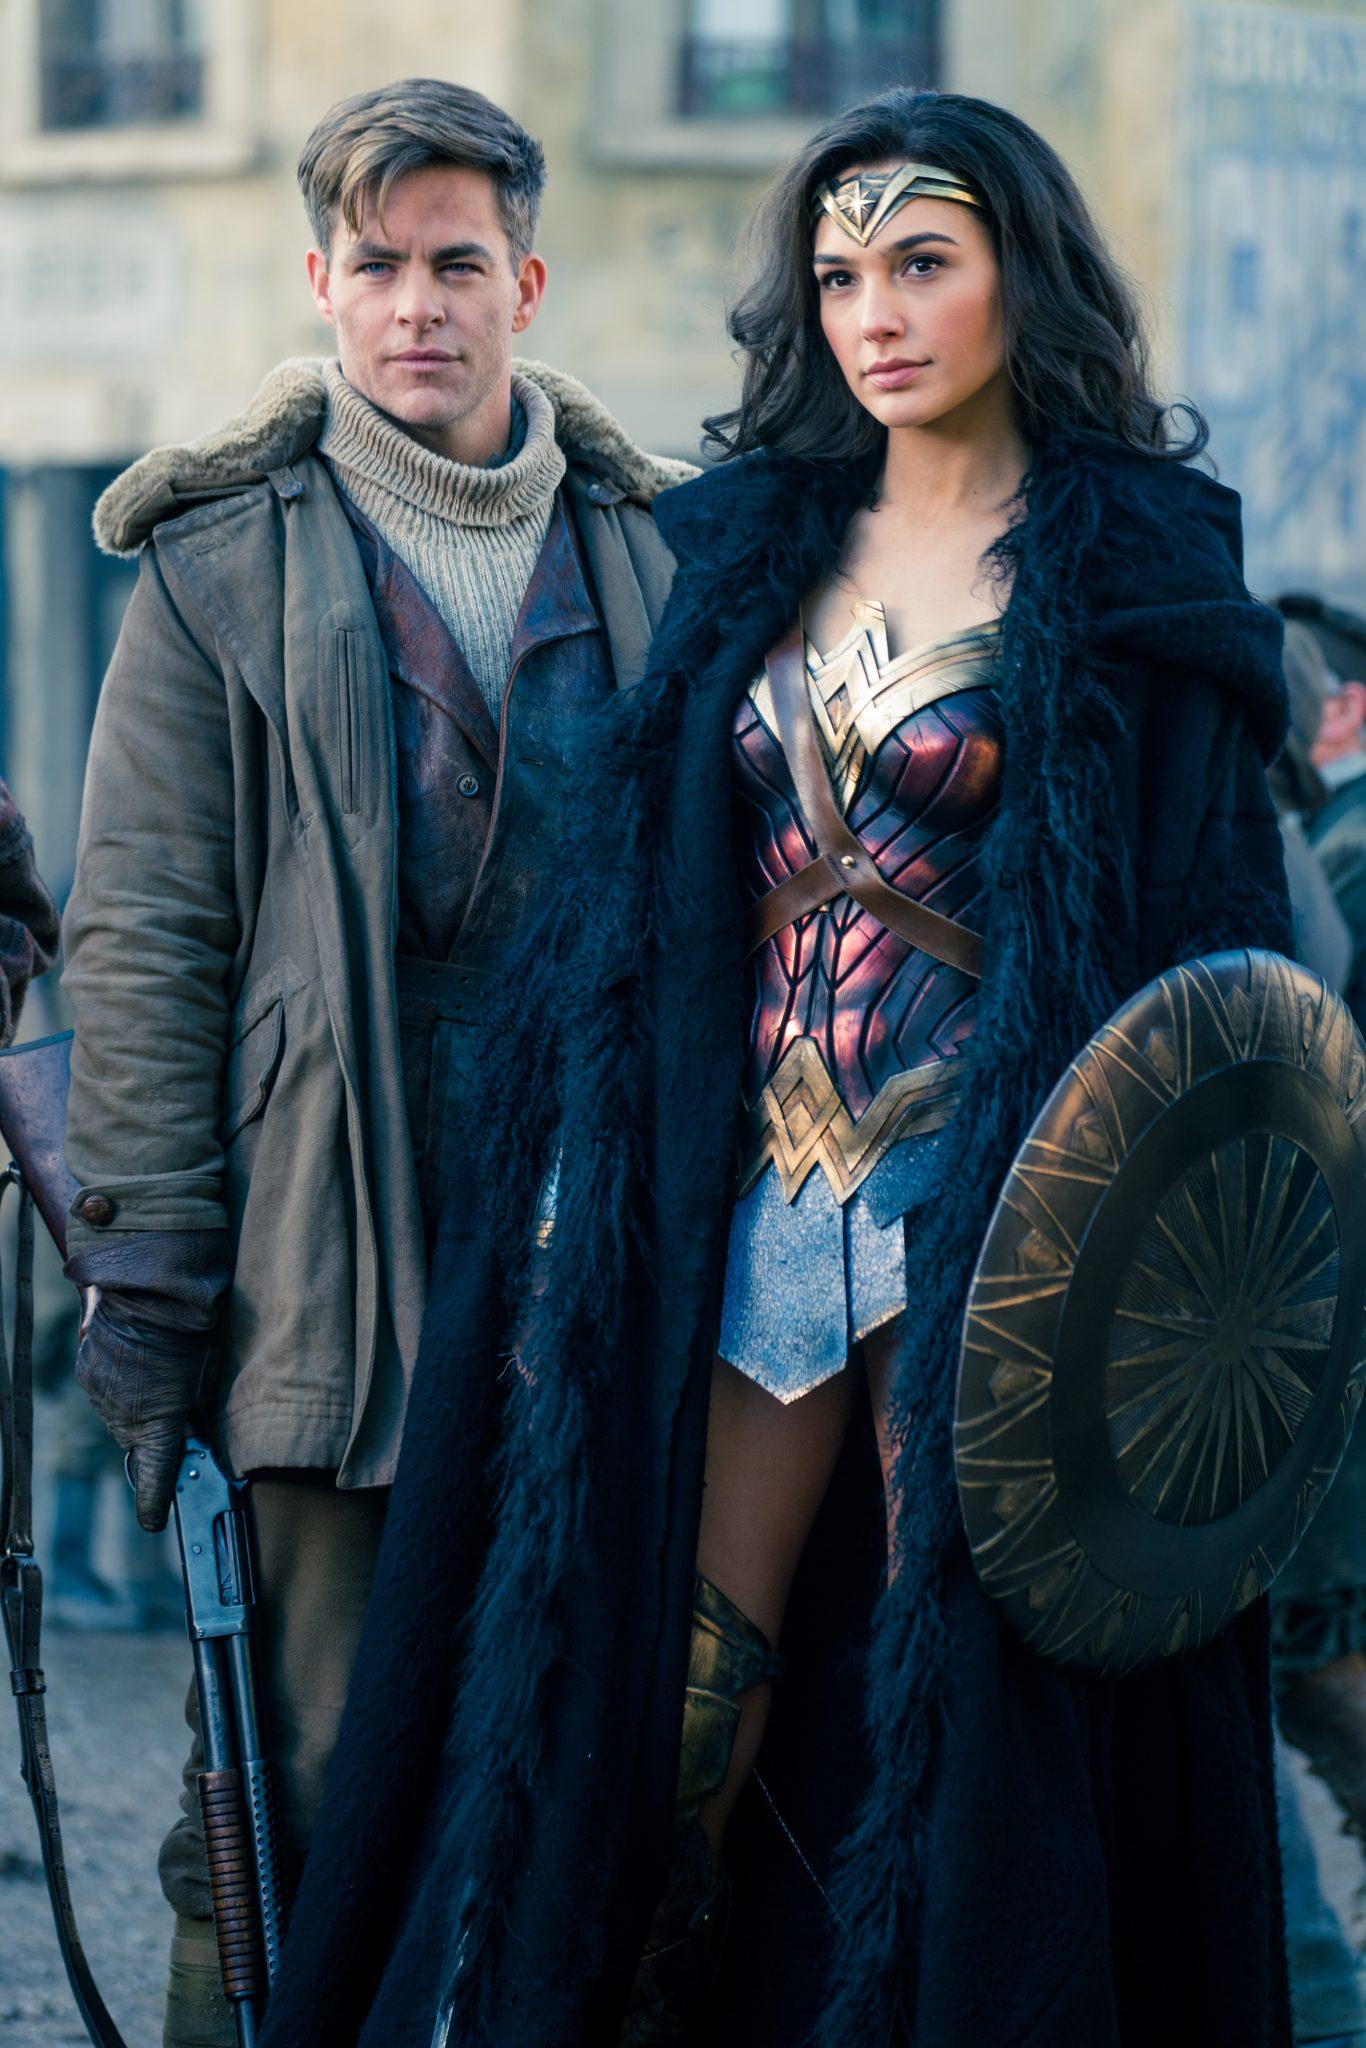 Wonder_Woman_Gald-Gadot-und-Chris-Pine